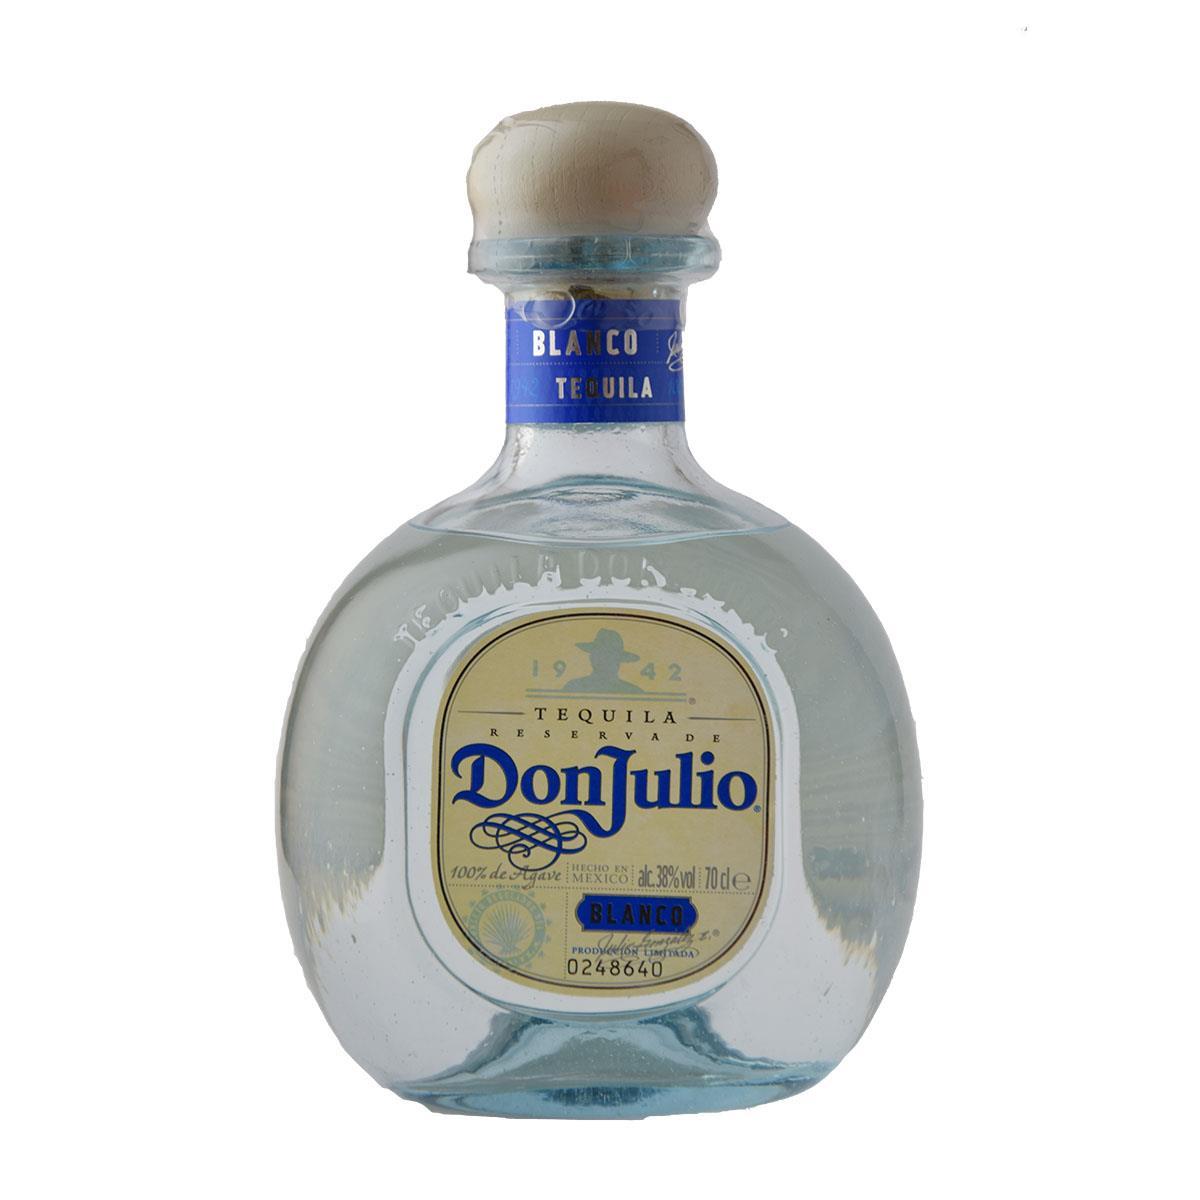 Don Julio Blanco Tequila 700ml